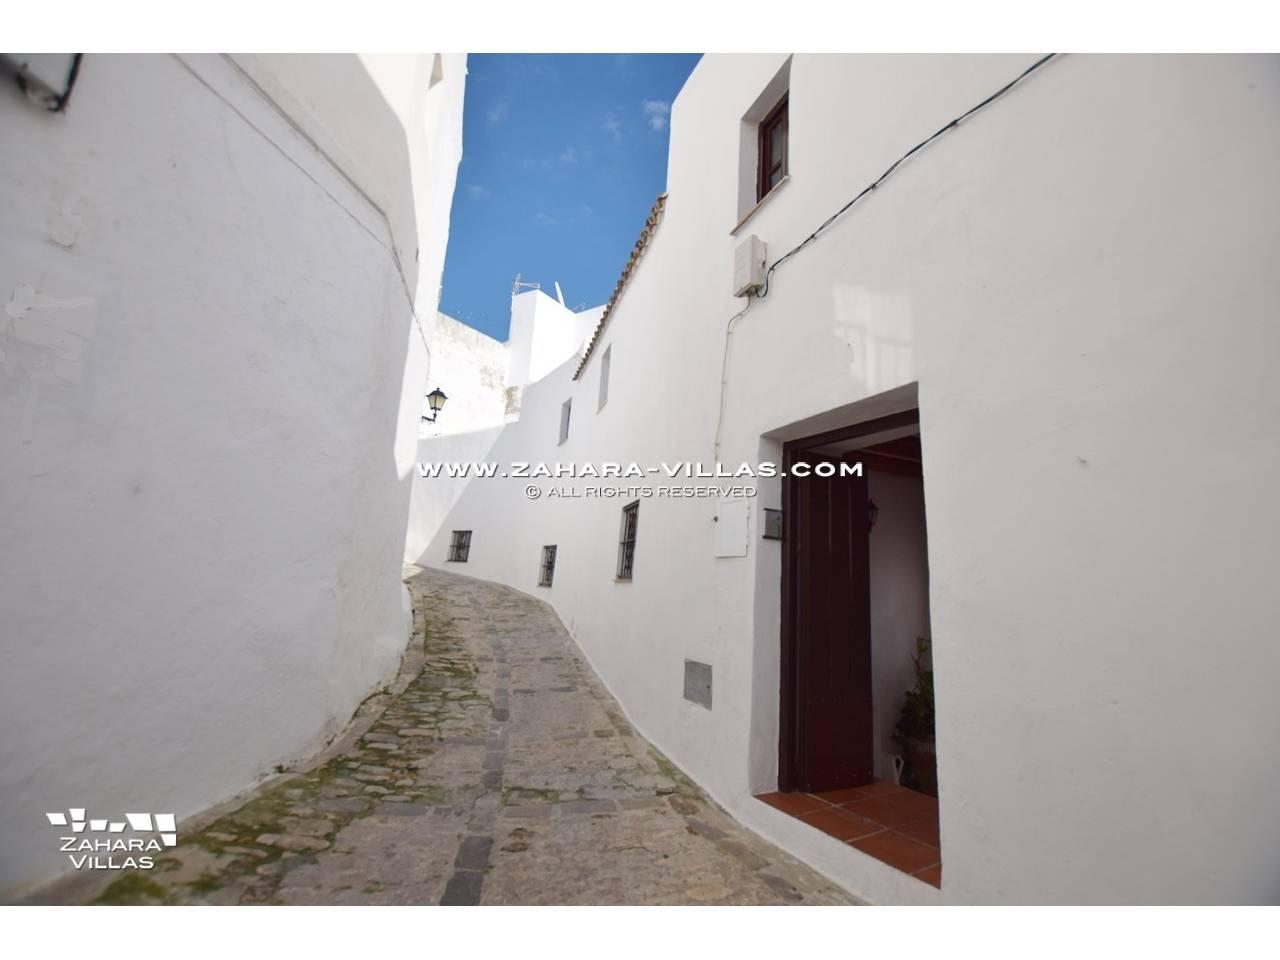 Imagen 19 de House, Apartment and Plot to build in the historic center of Vejer de la Frontera